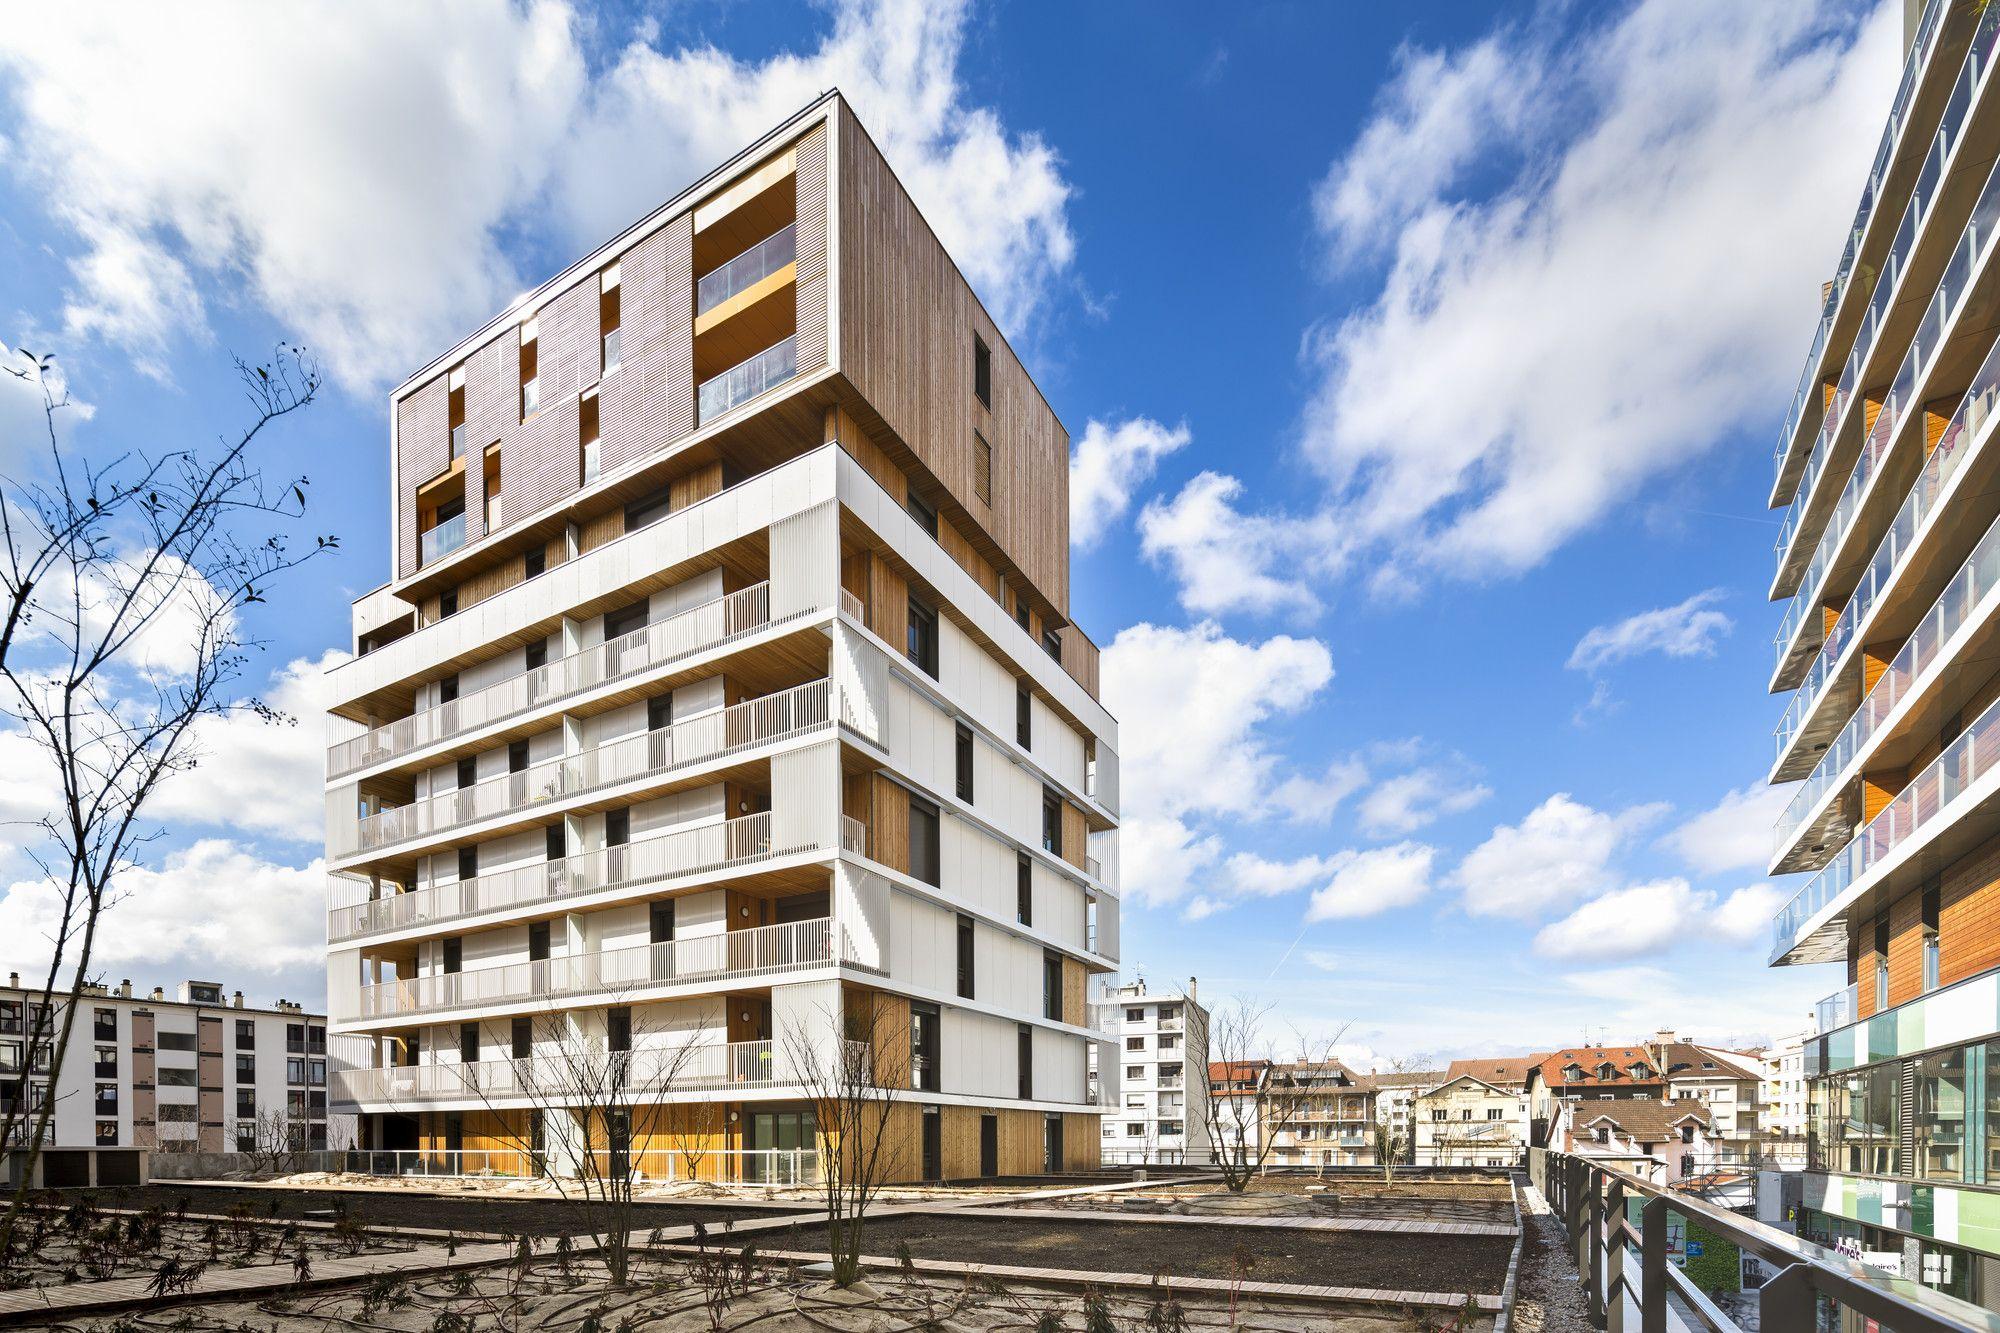 Housing And Shops Complex Ameller Dubois Associes Facade Architecture Architecture Exterior Urban Design Architecture